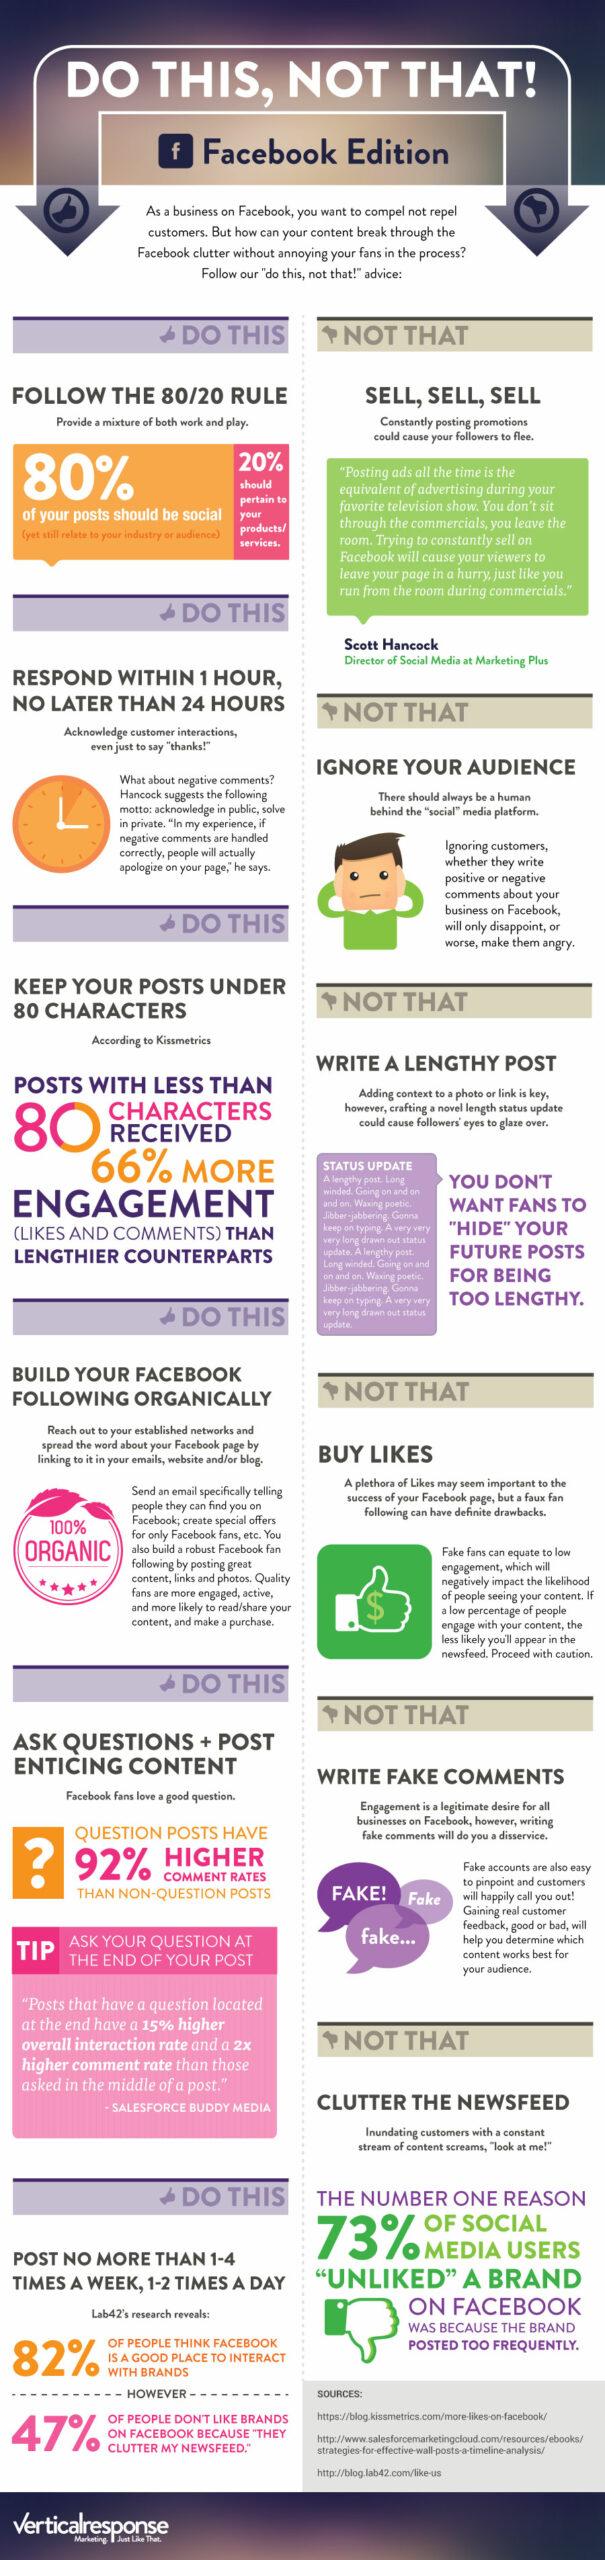 comunicazione-efficace-su-facebook